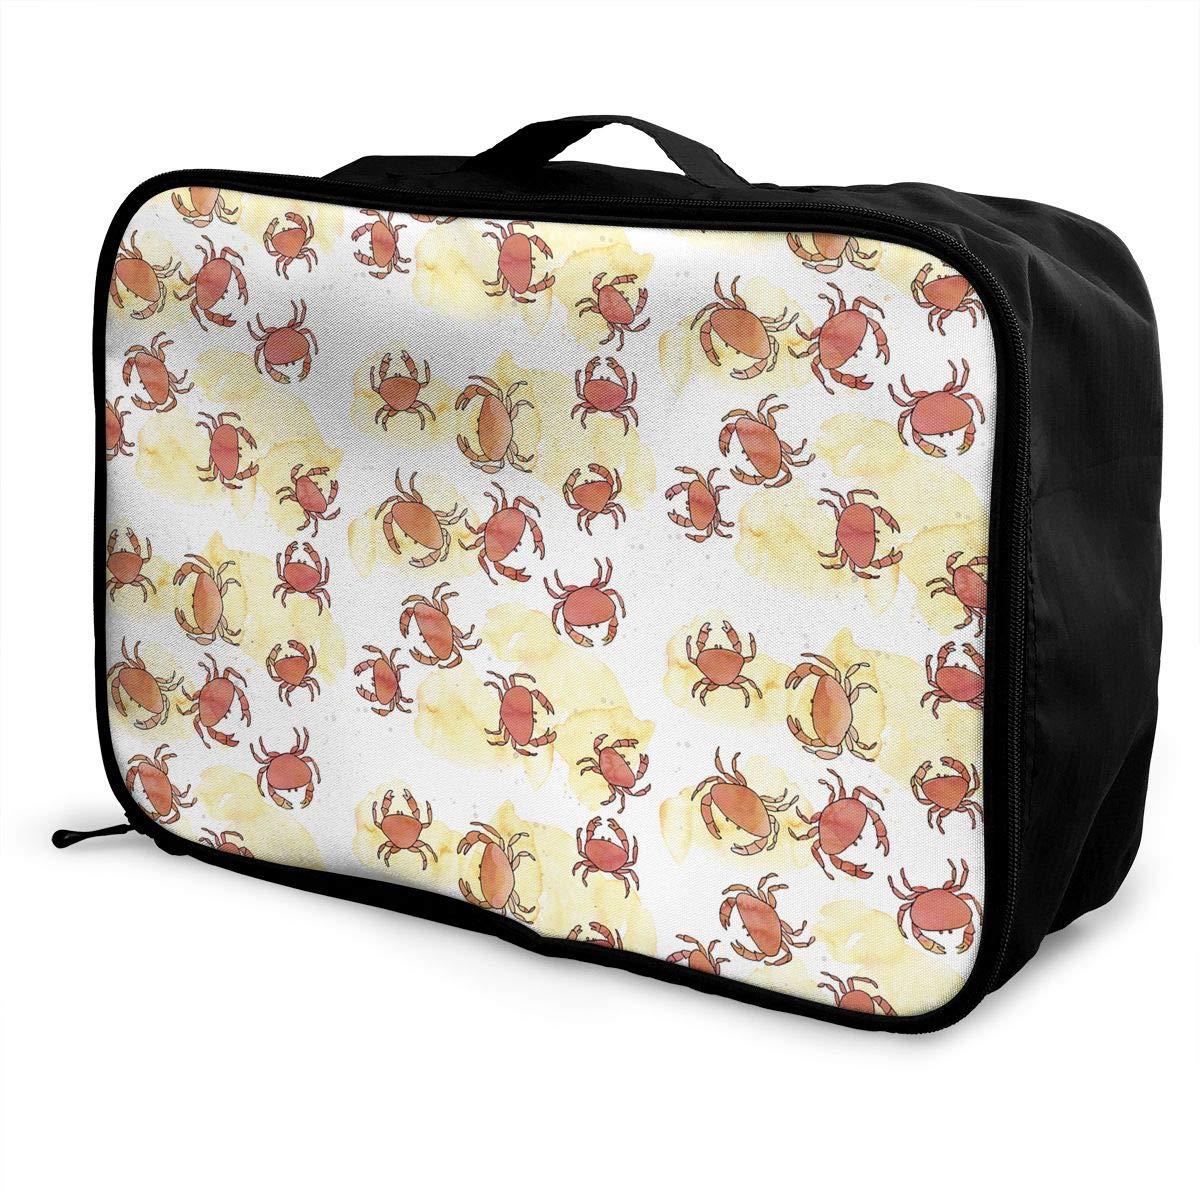 Travel Luggage Duffle Bag Lightweight Portable Handbag Pink Crab Print Large Capacity Waterproof Foldable Storage Tote